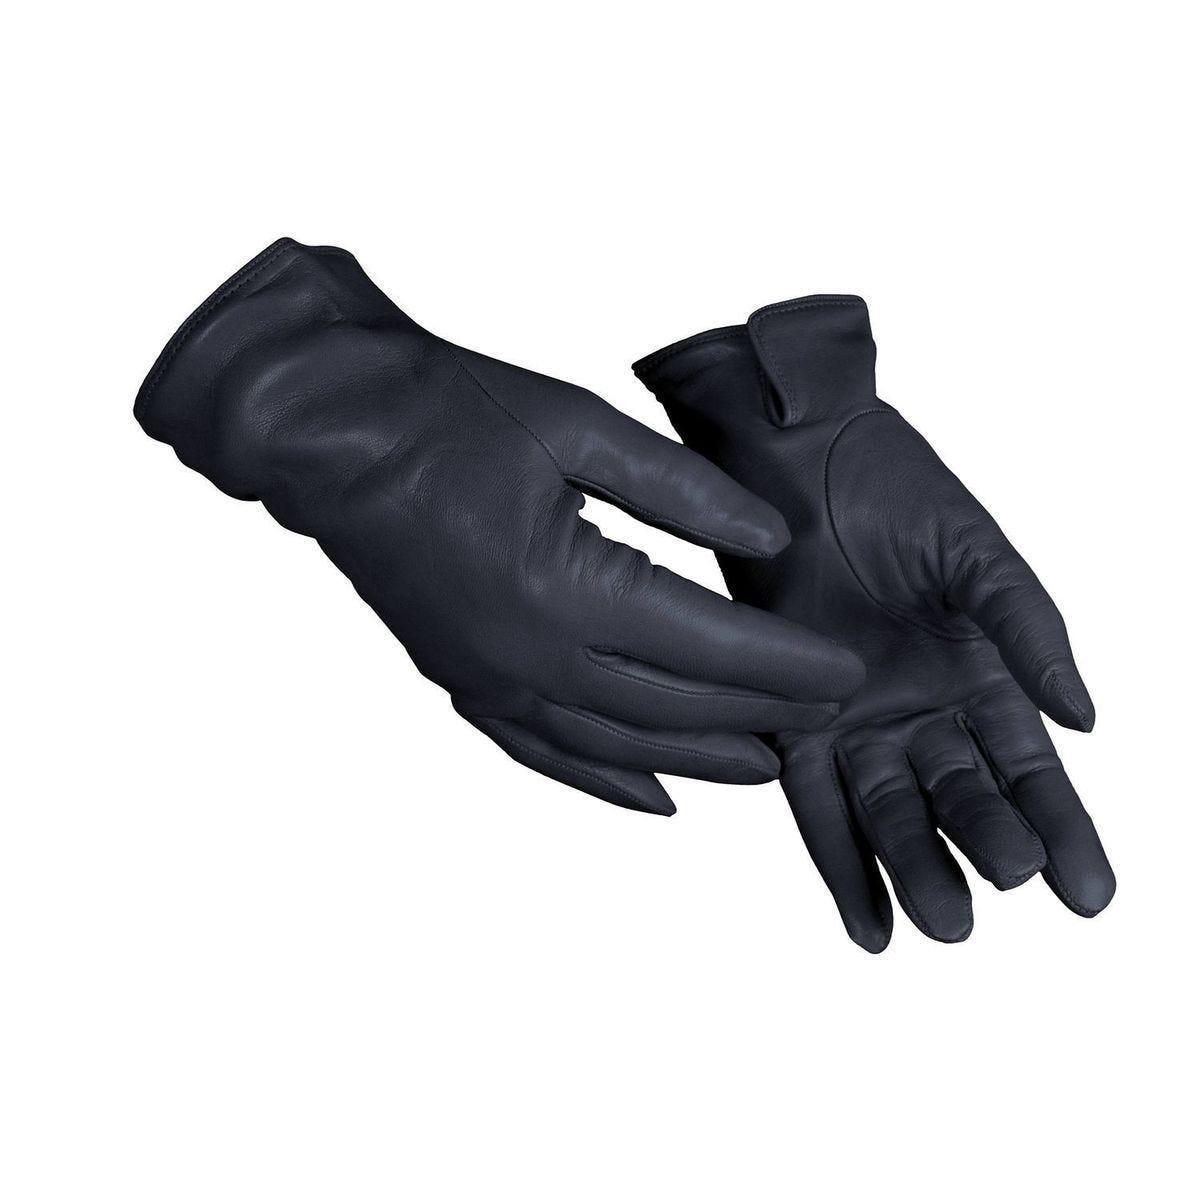 Gants hiver pour femmes - 6.5 - Bleu Marine - Agneau Nappa